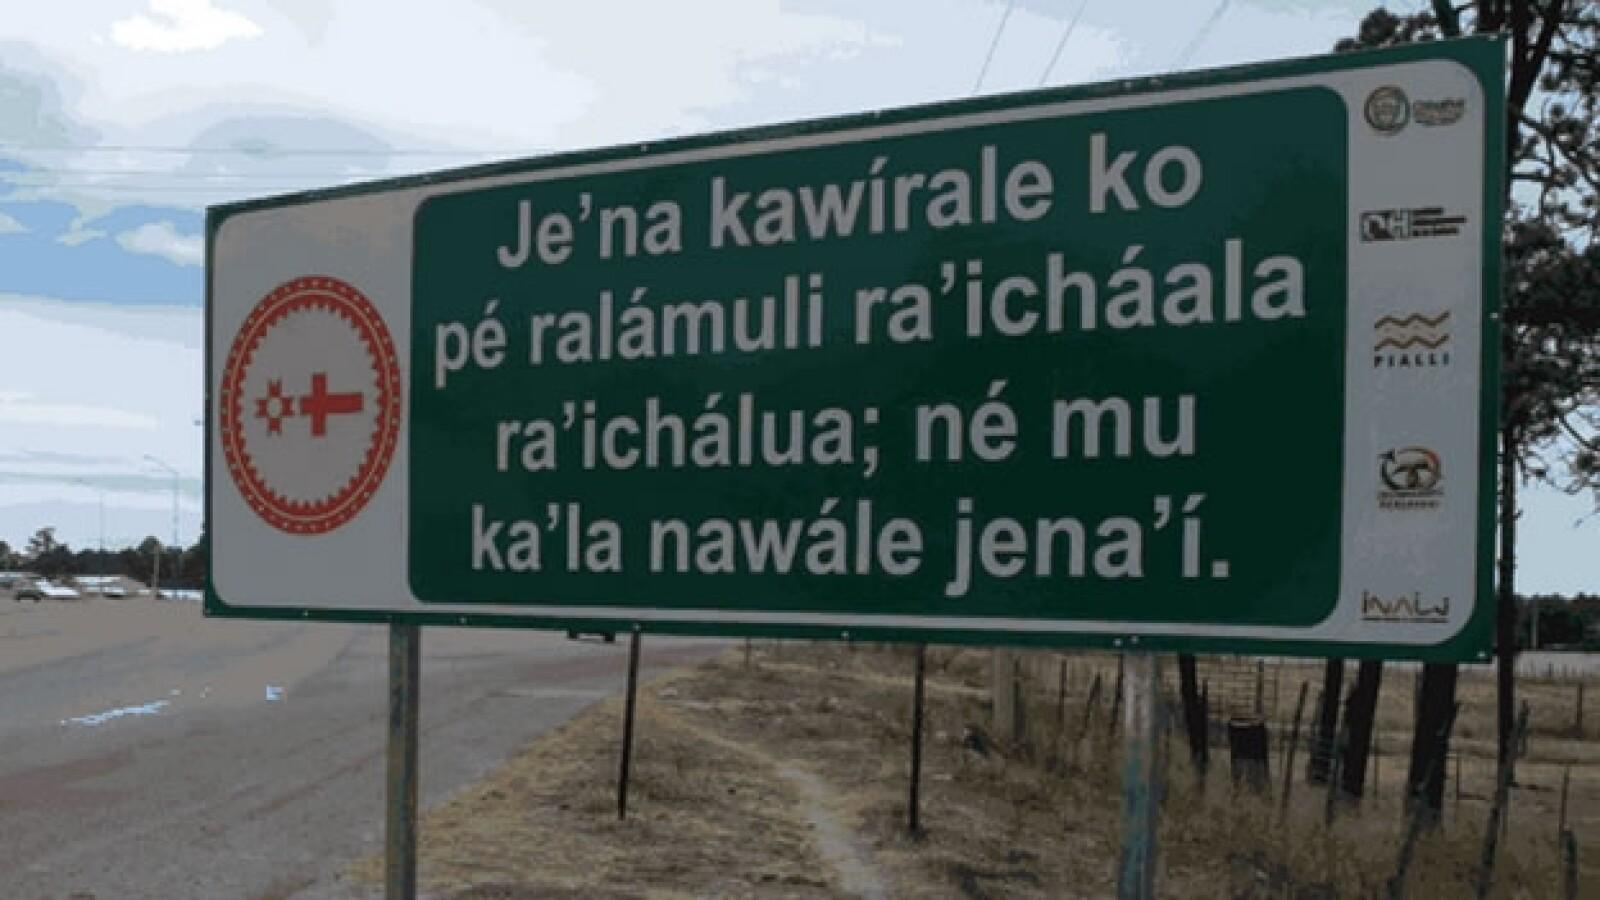 señaletica en lengua tarahumara